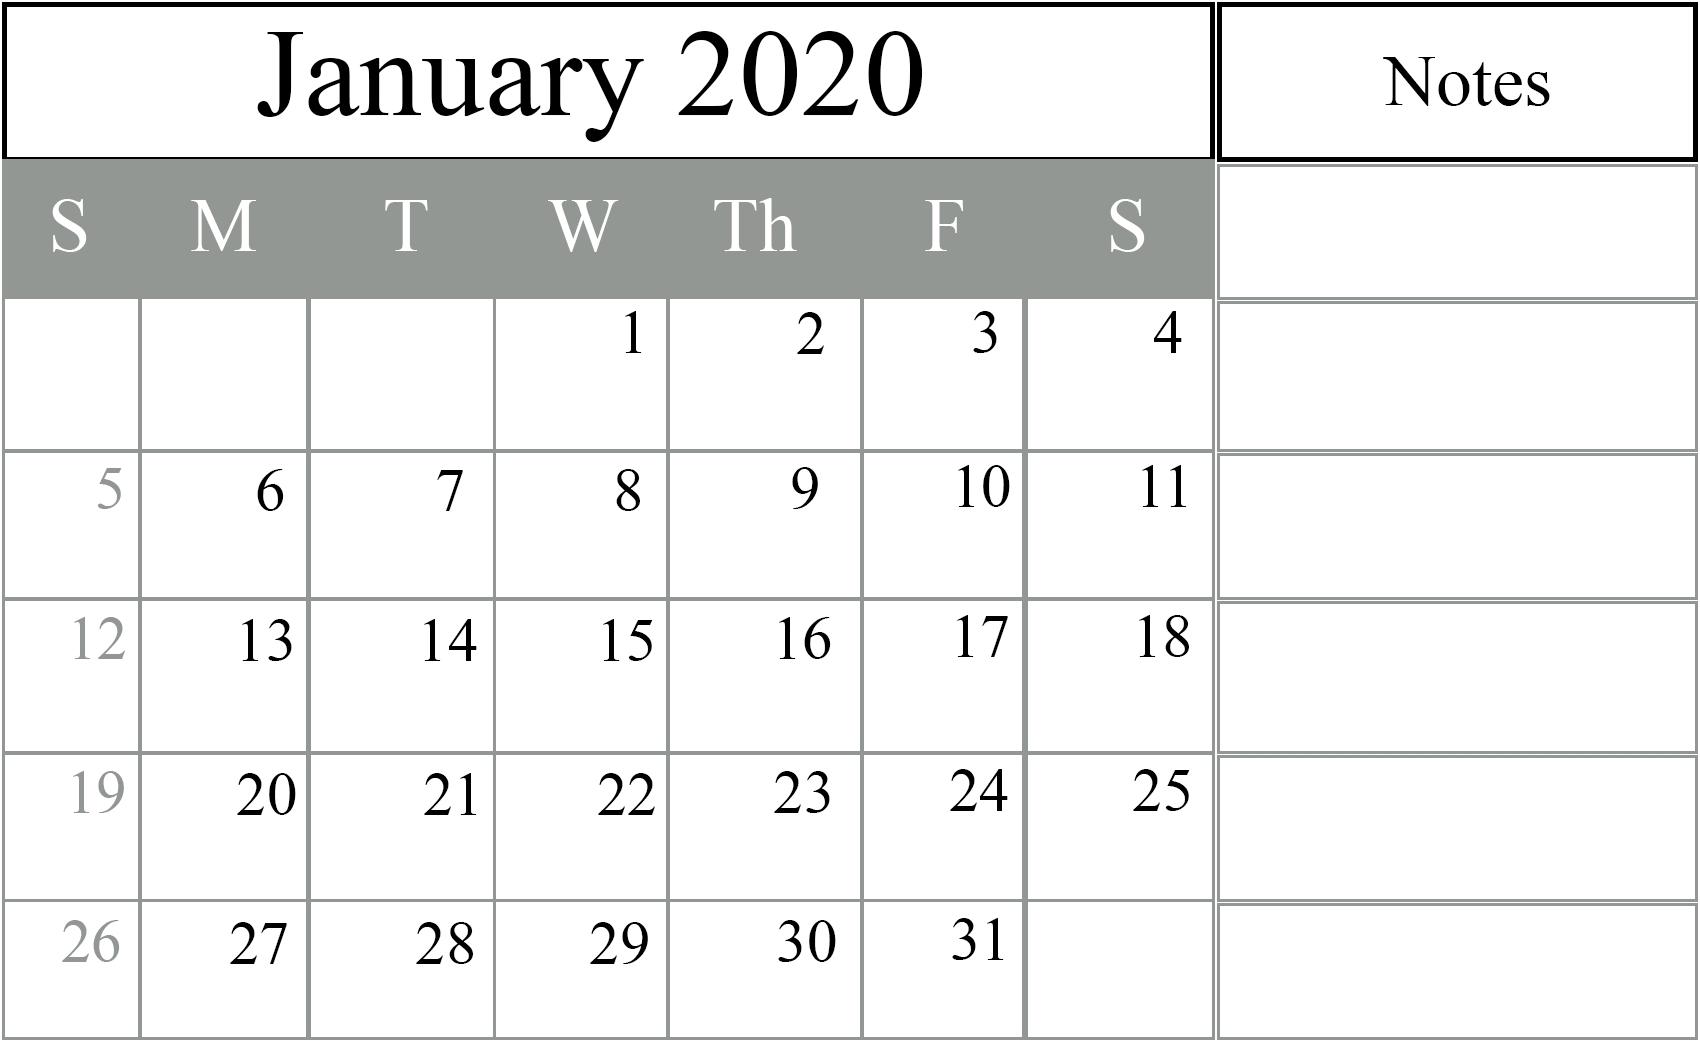 Military Julian Calendar 2020 Printable - Template  Army Julian Date